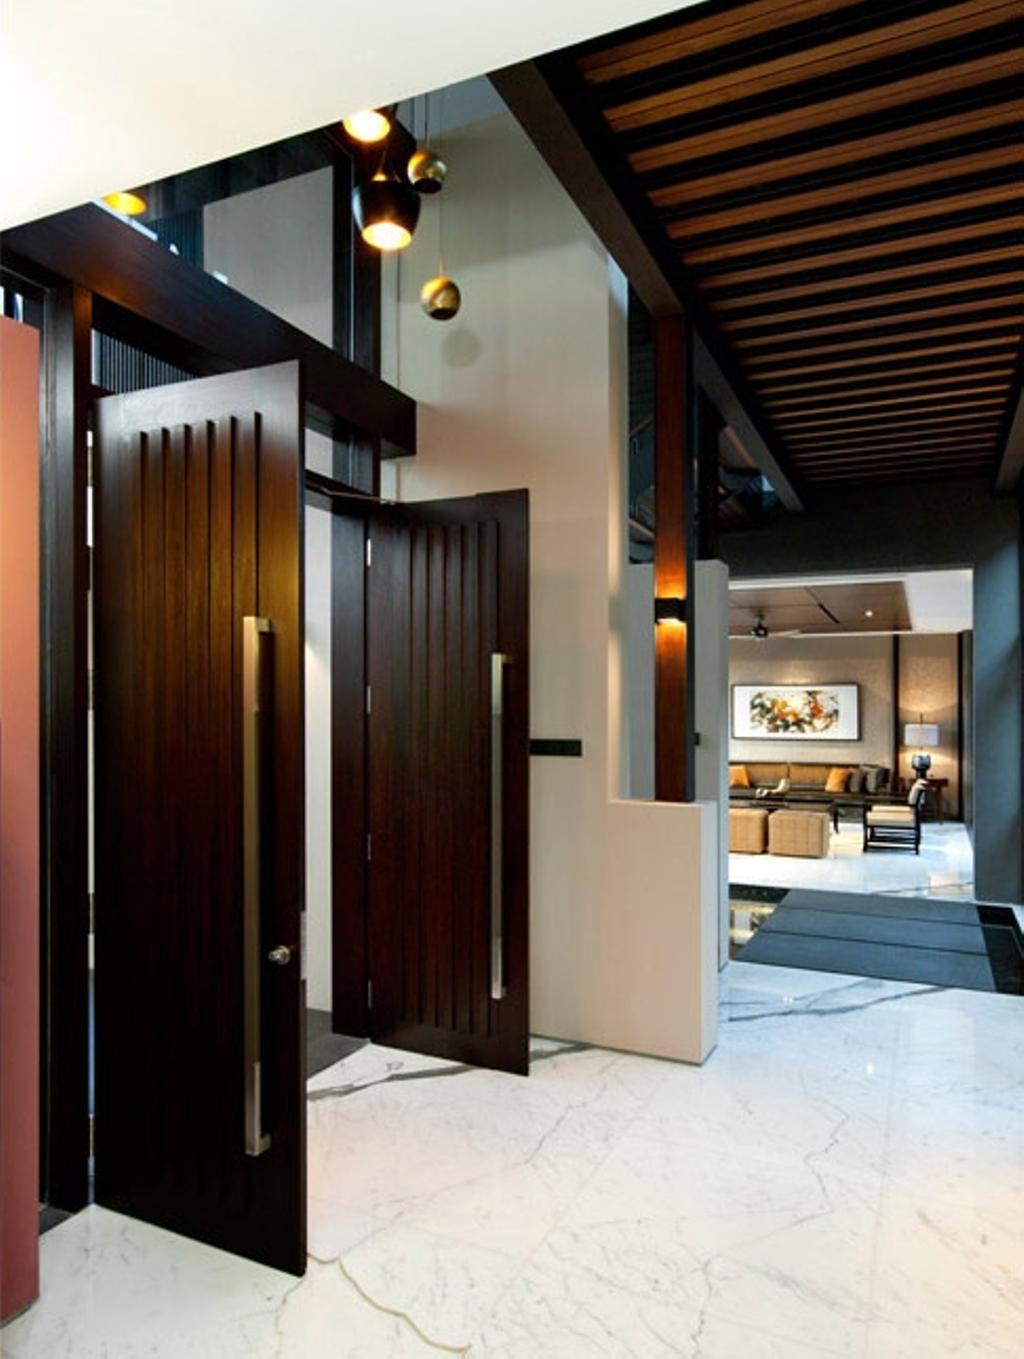 Traditional, Landed, Frankel Walk, Architect, Timur Designs, Electronics, Entertainment Center, Door, Folding Door